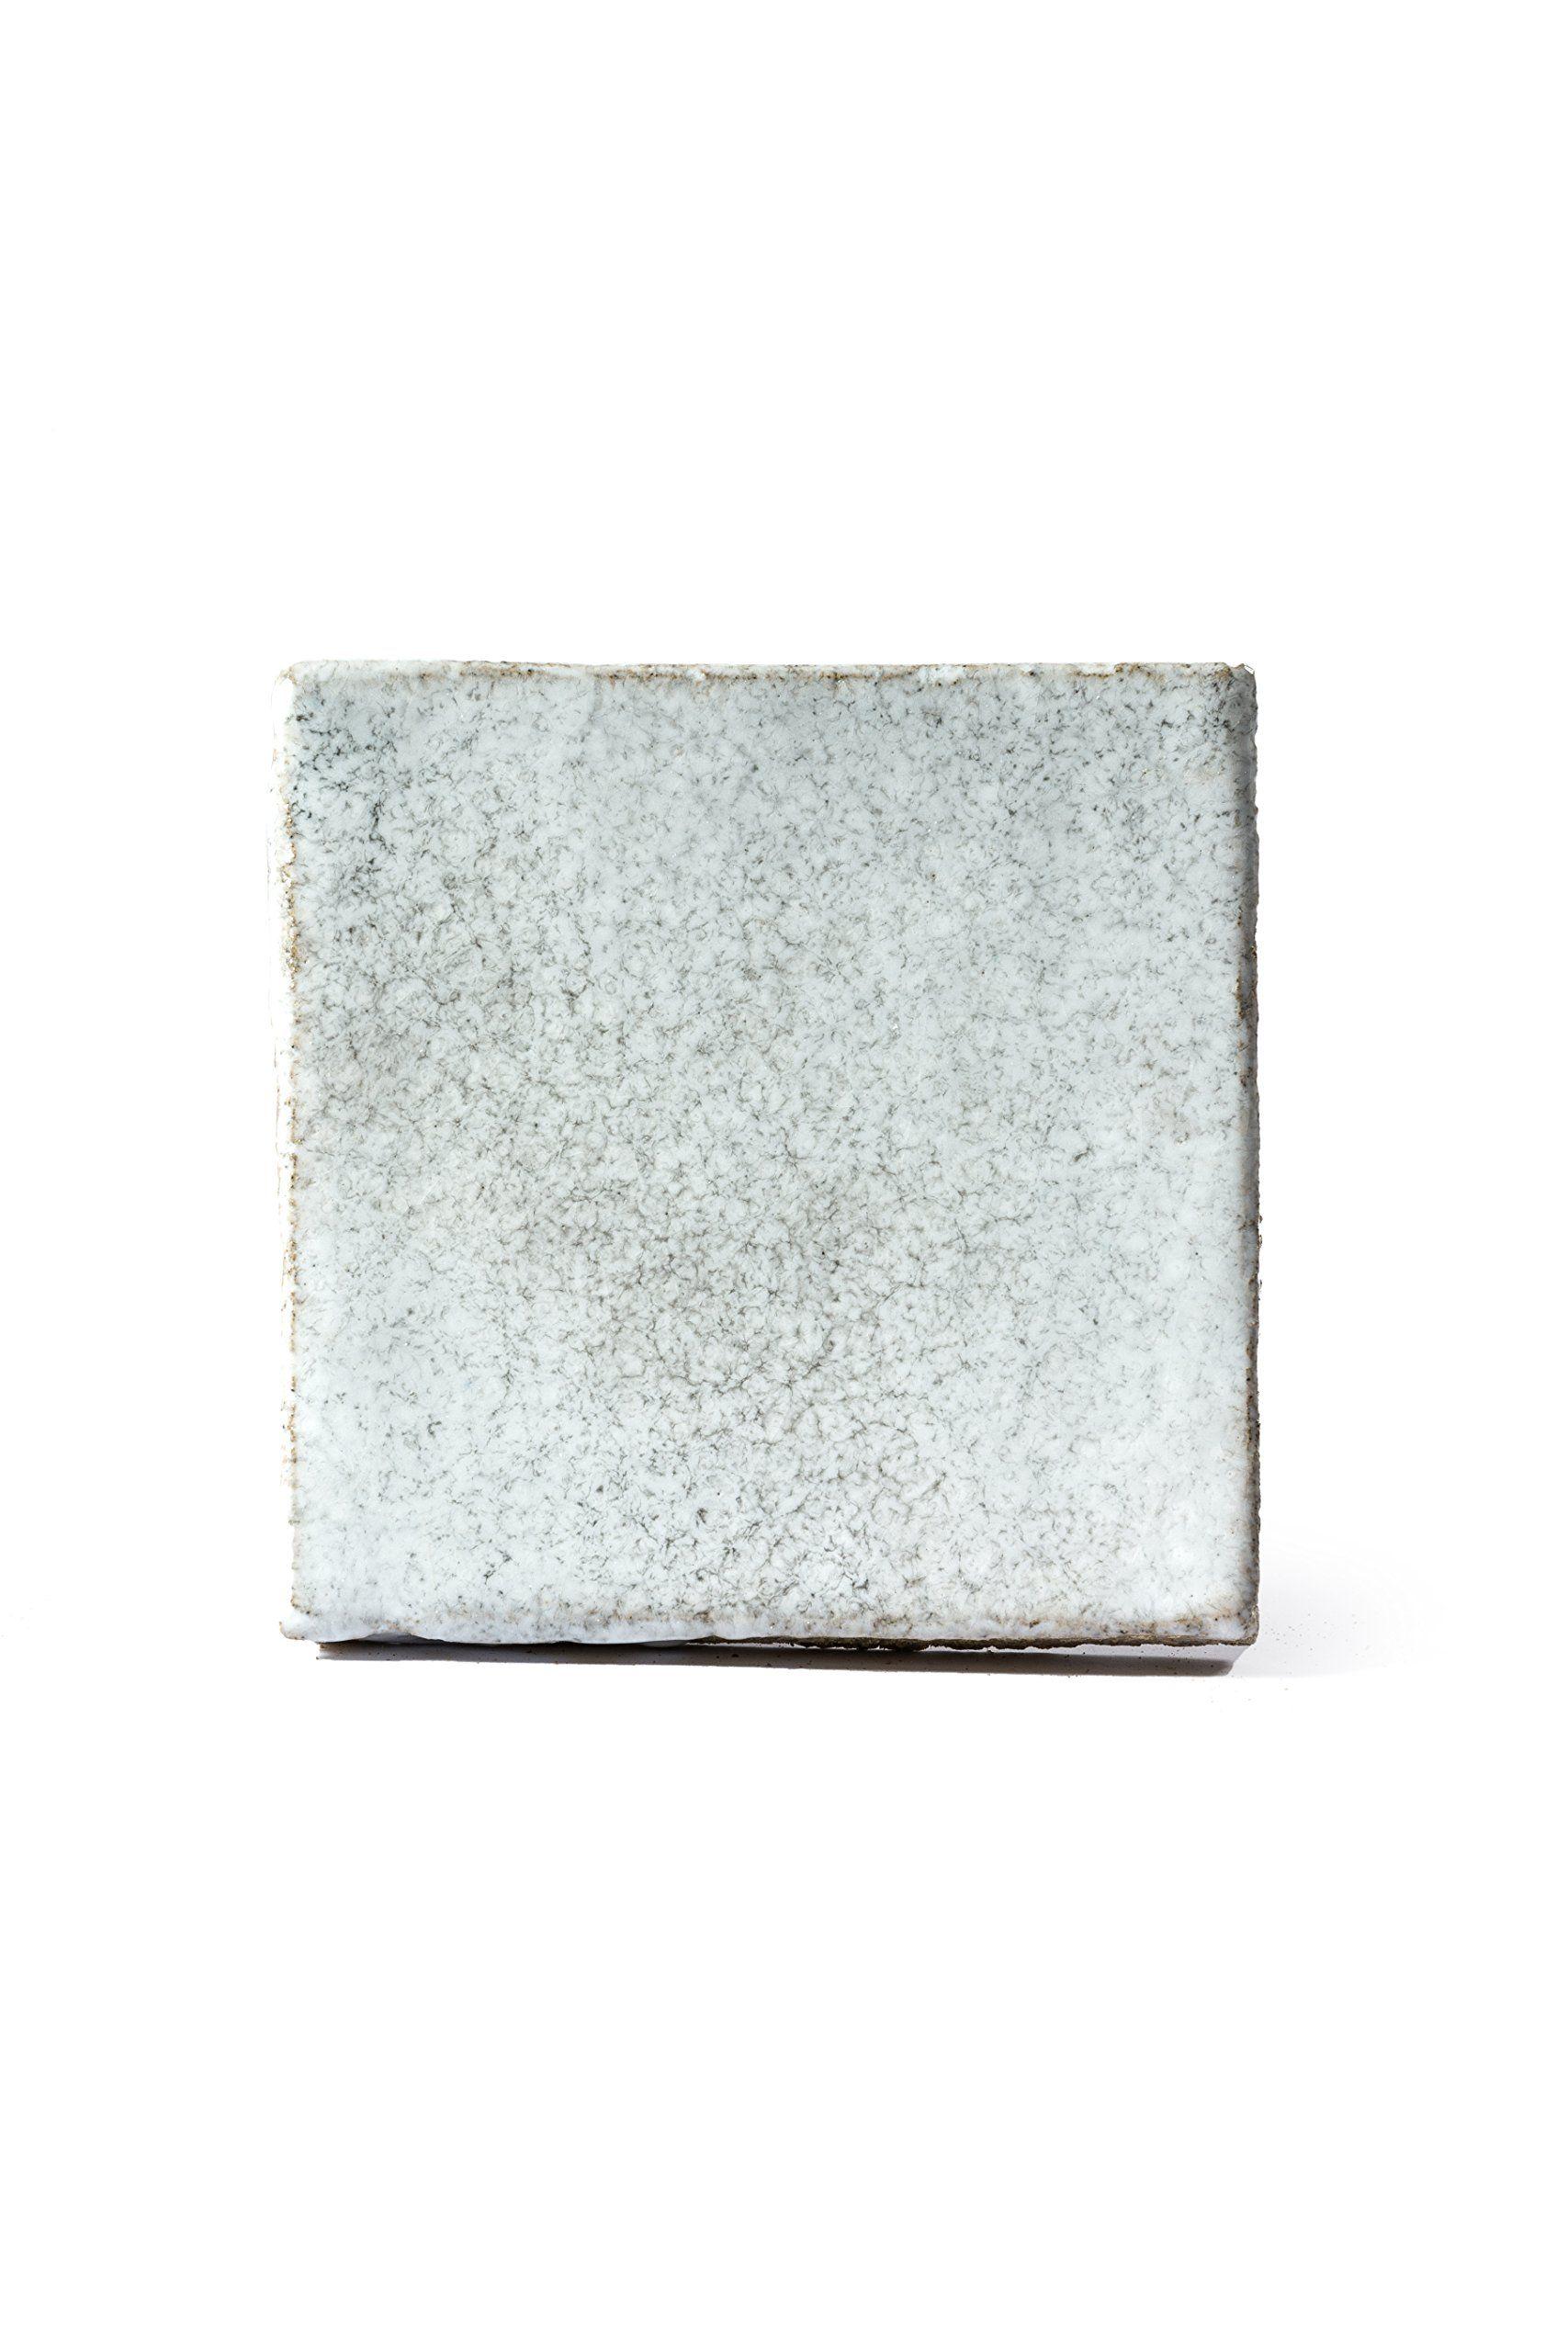 Hand Glazed Ceramic Tile 10x10 Hand Glazed Ceramic Tile Dimensions